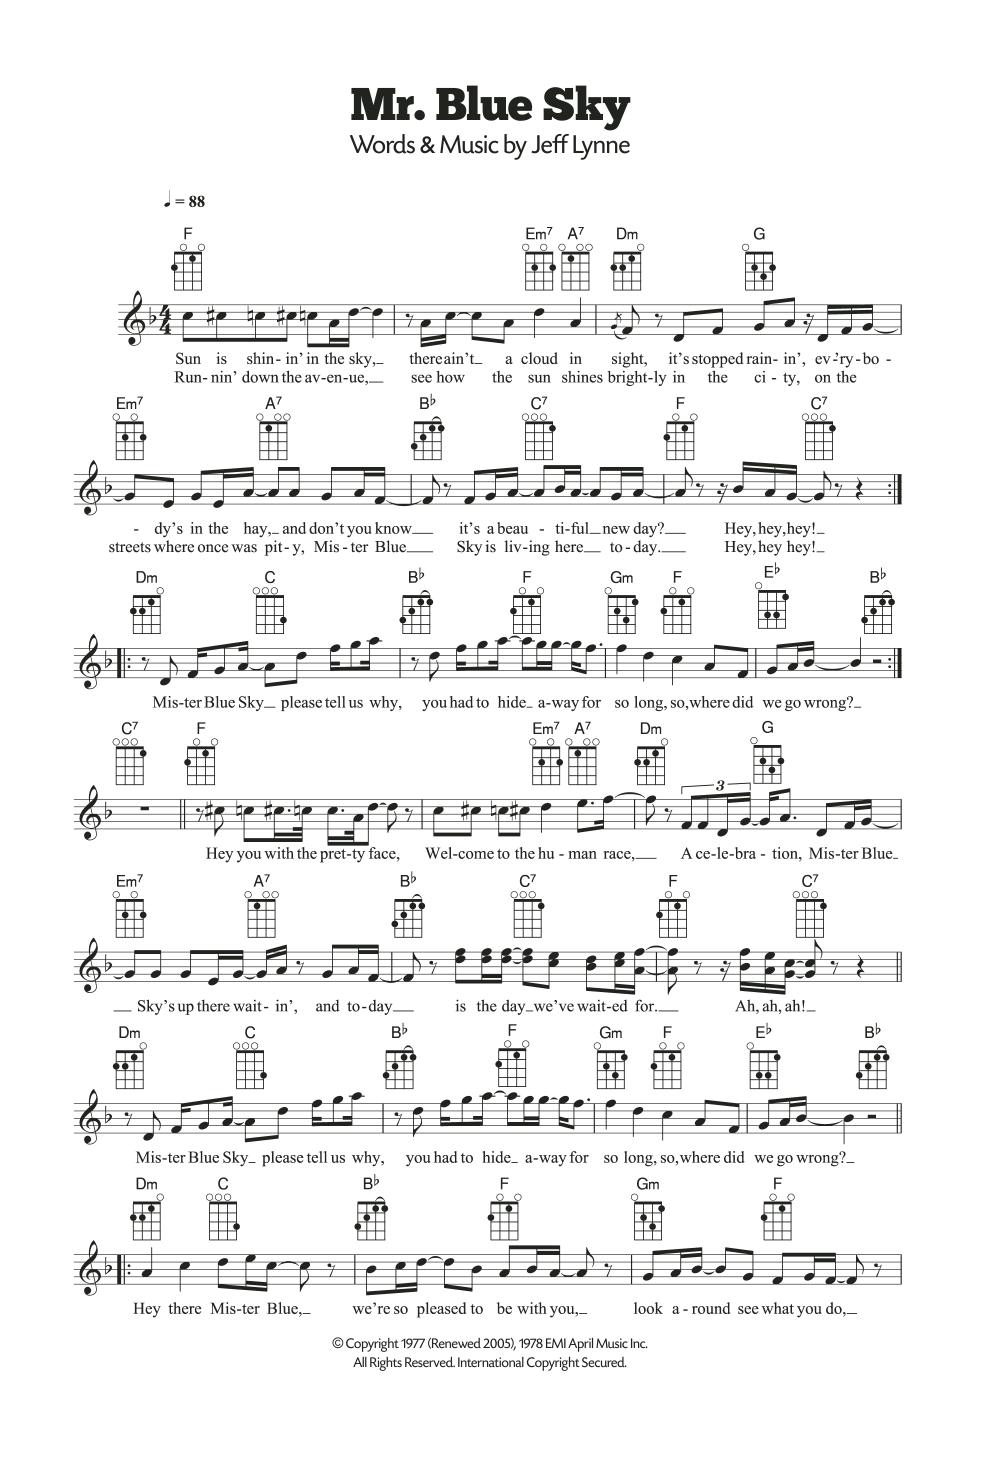 Lyrics from abba